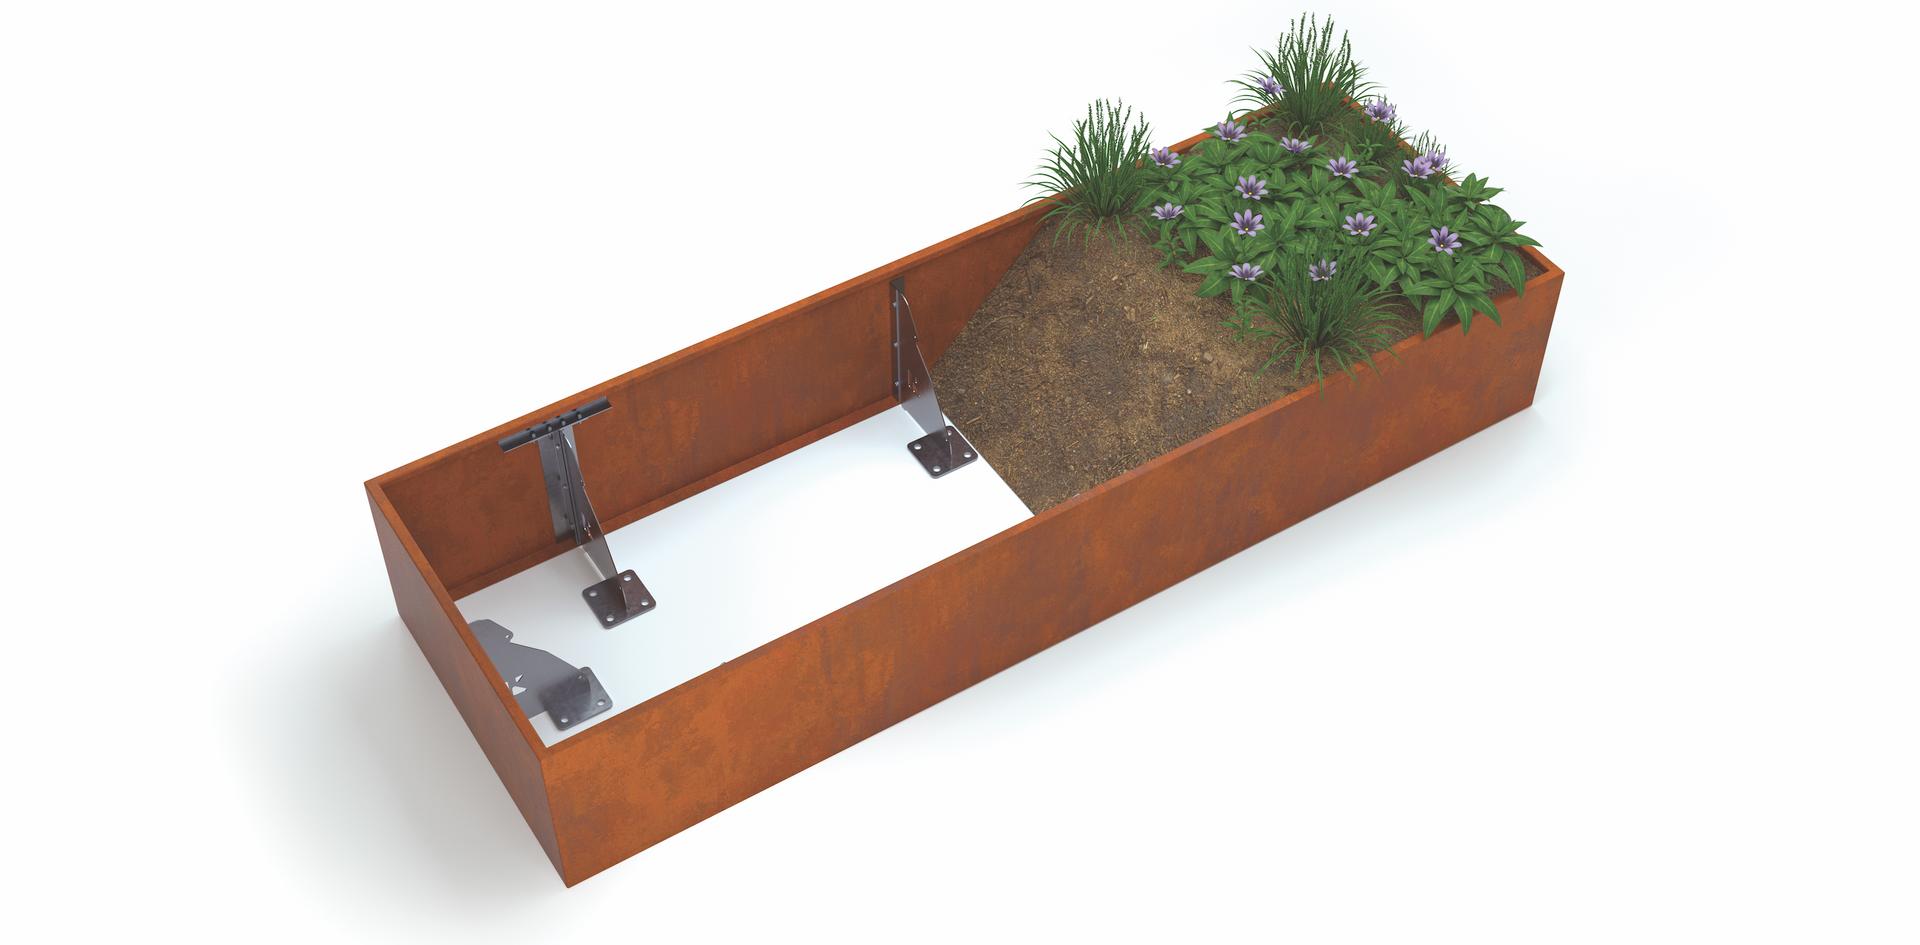 Boxx Series Planter System